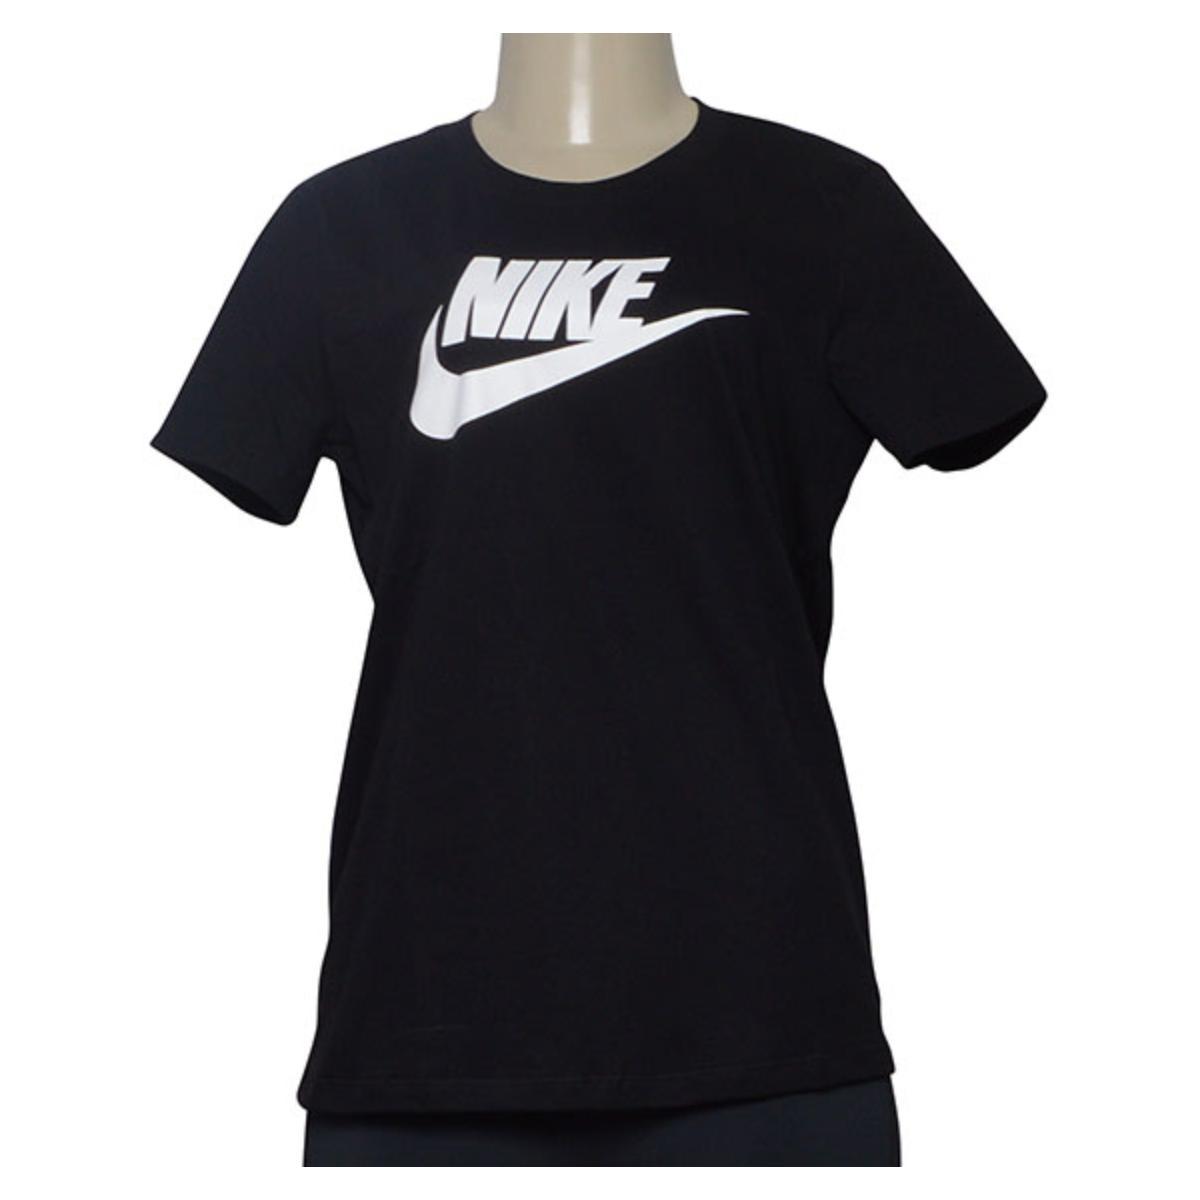 T-shirt Feminino Nike Bv6169-010 Sportswear Preto